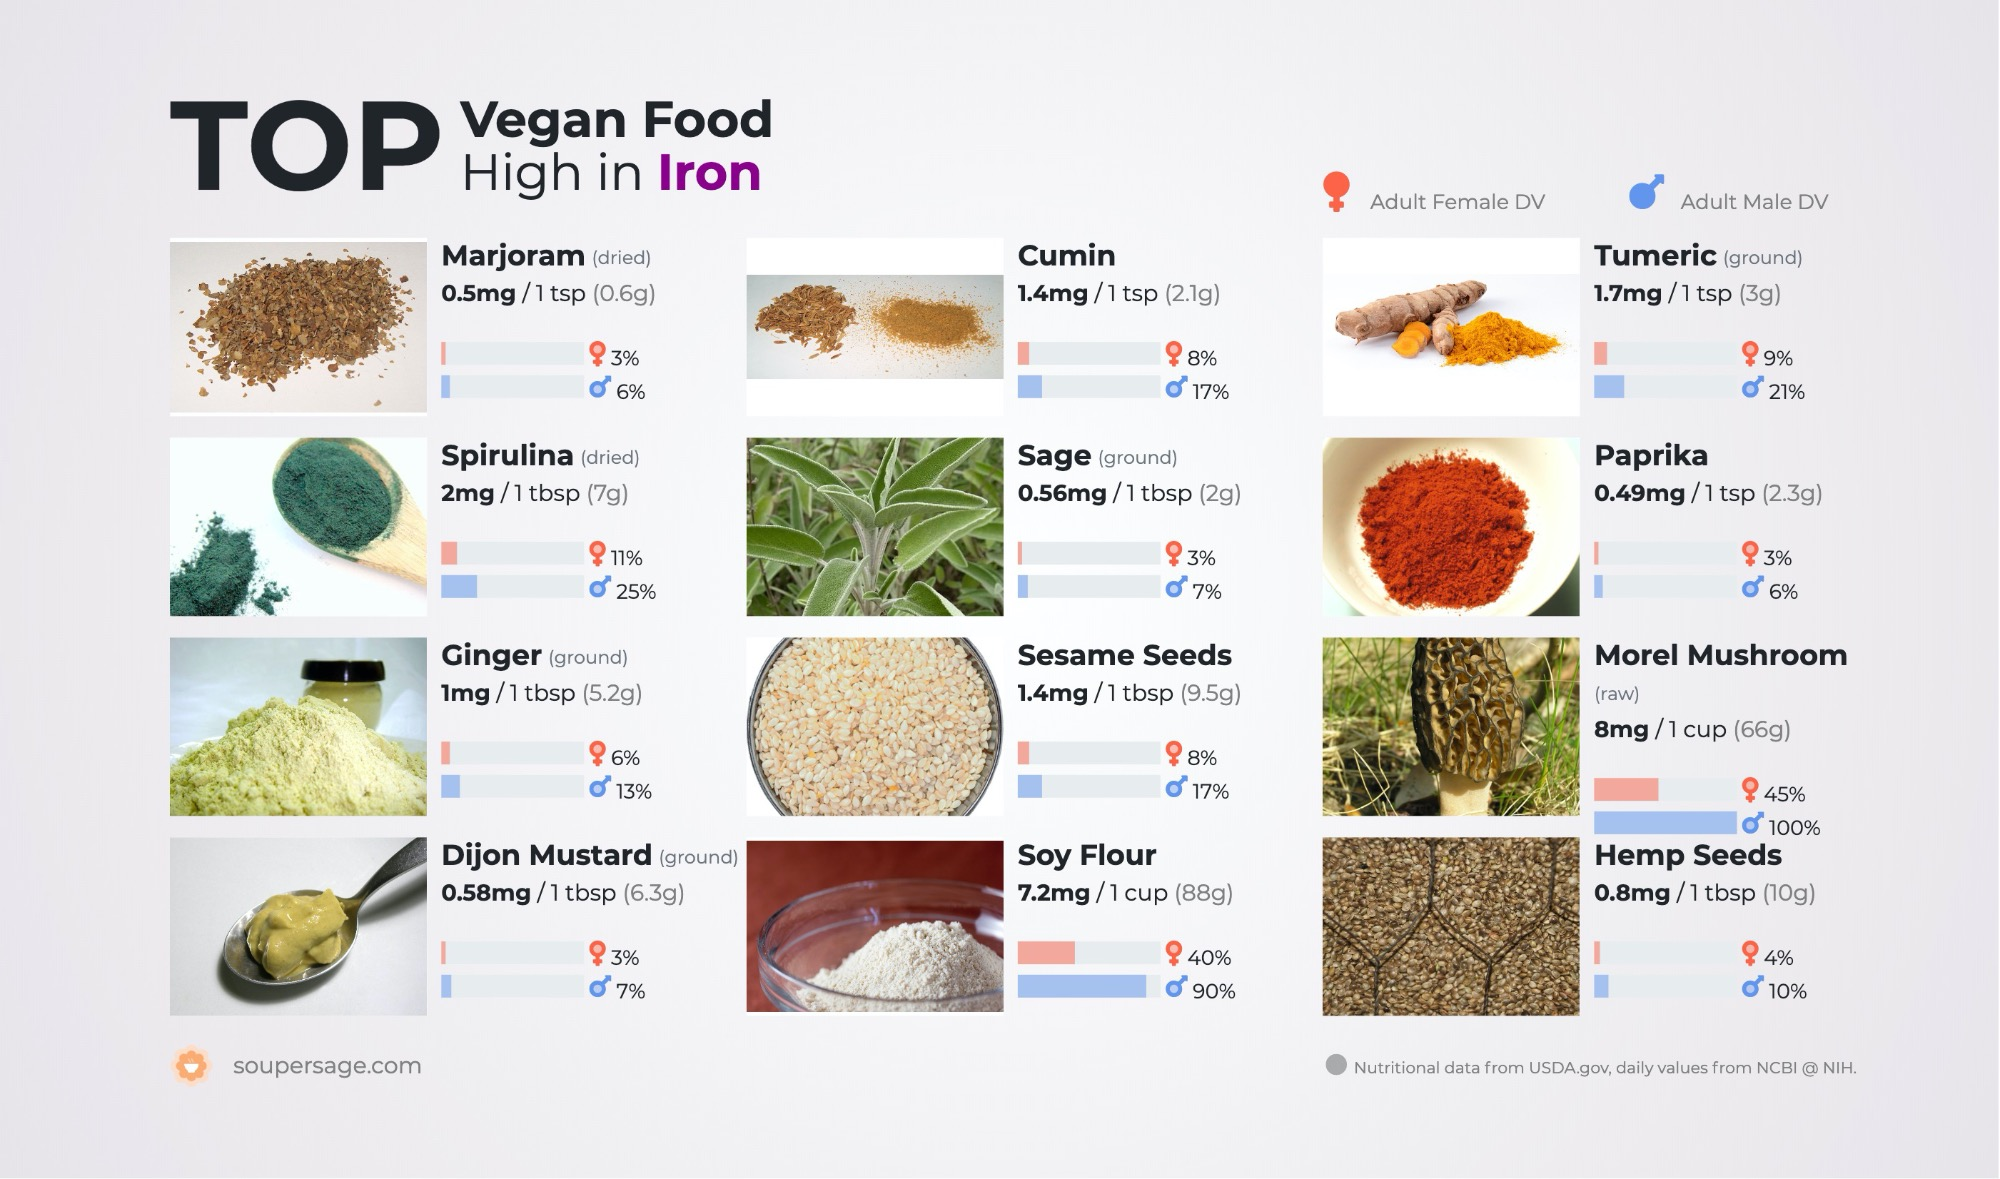 image of Top Vegan Food High in Iron